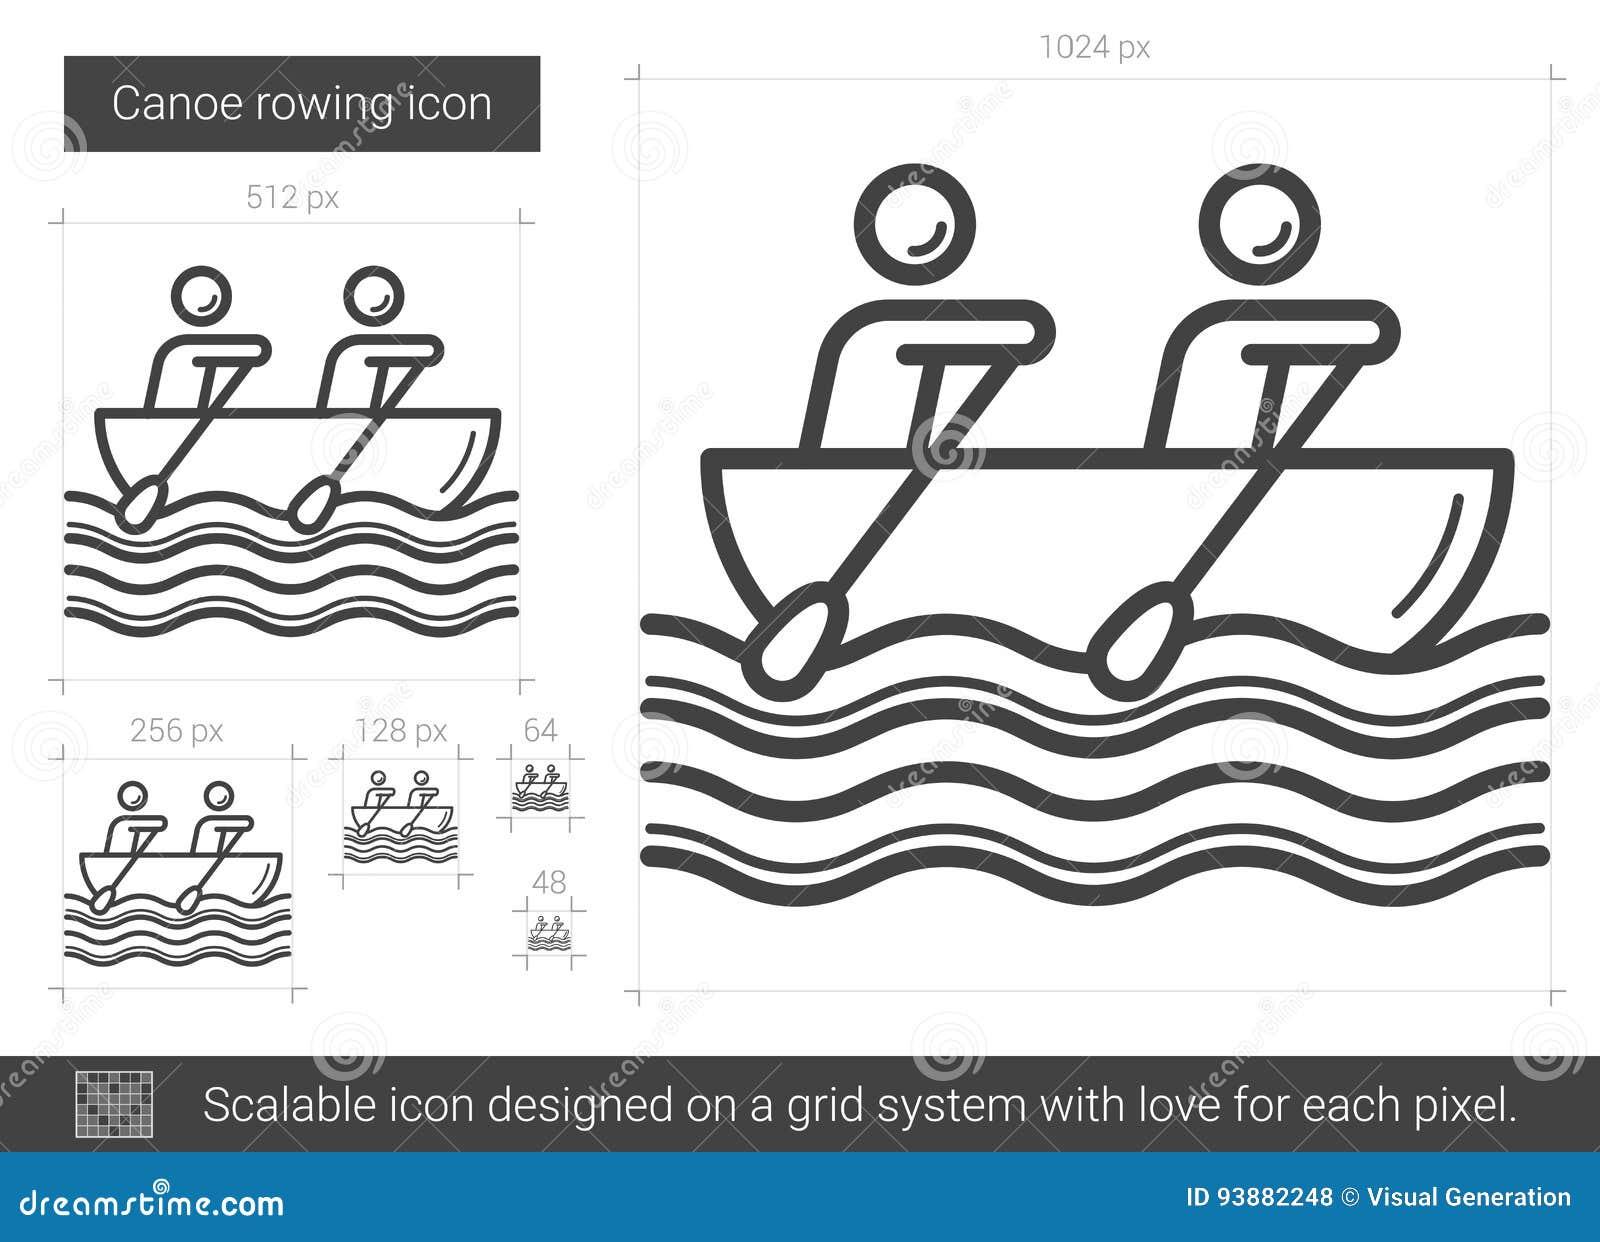 Canoe rowing line icon.